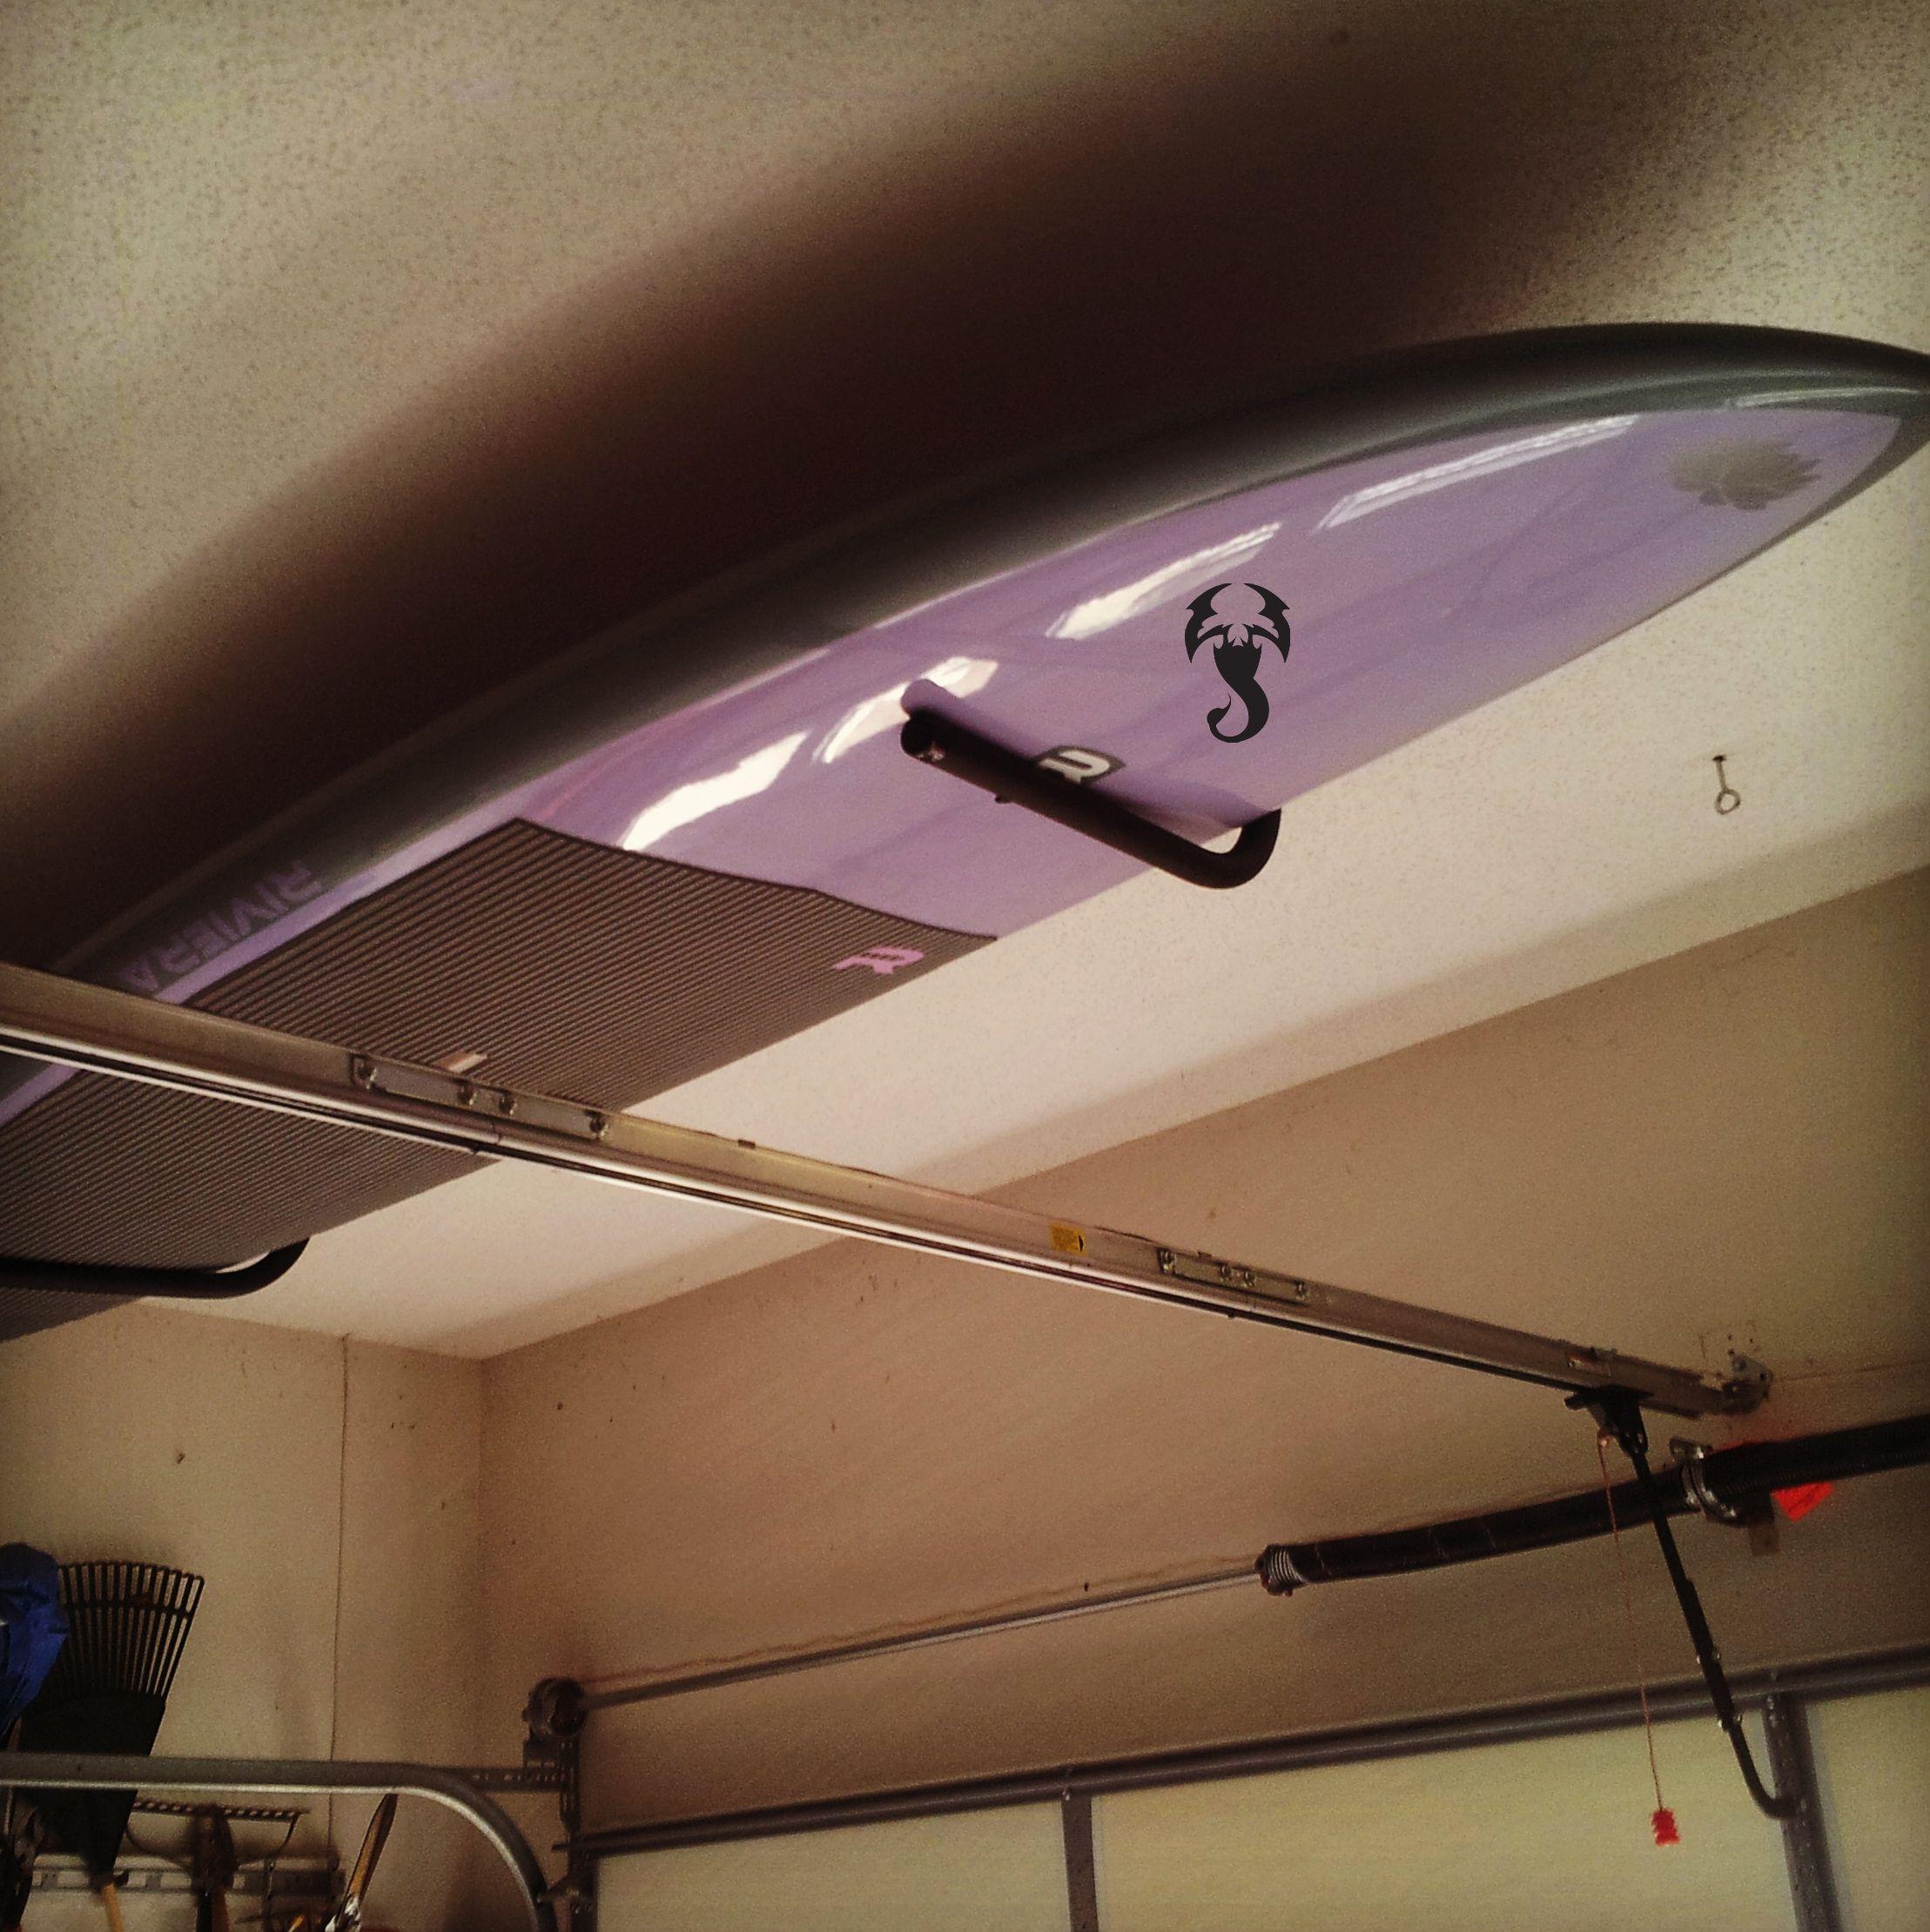 paddleboard ceiling storage rack for garage sup paddleboard sup paddleboard ceiling storage rack for garage sup